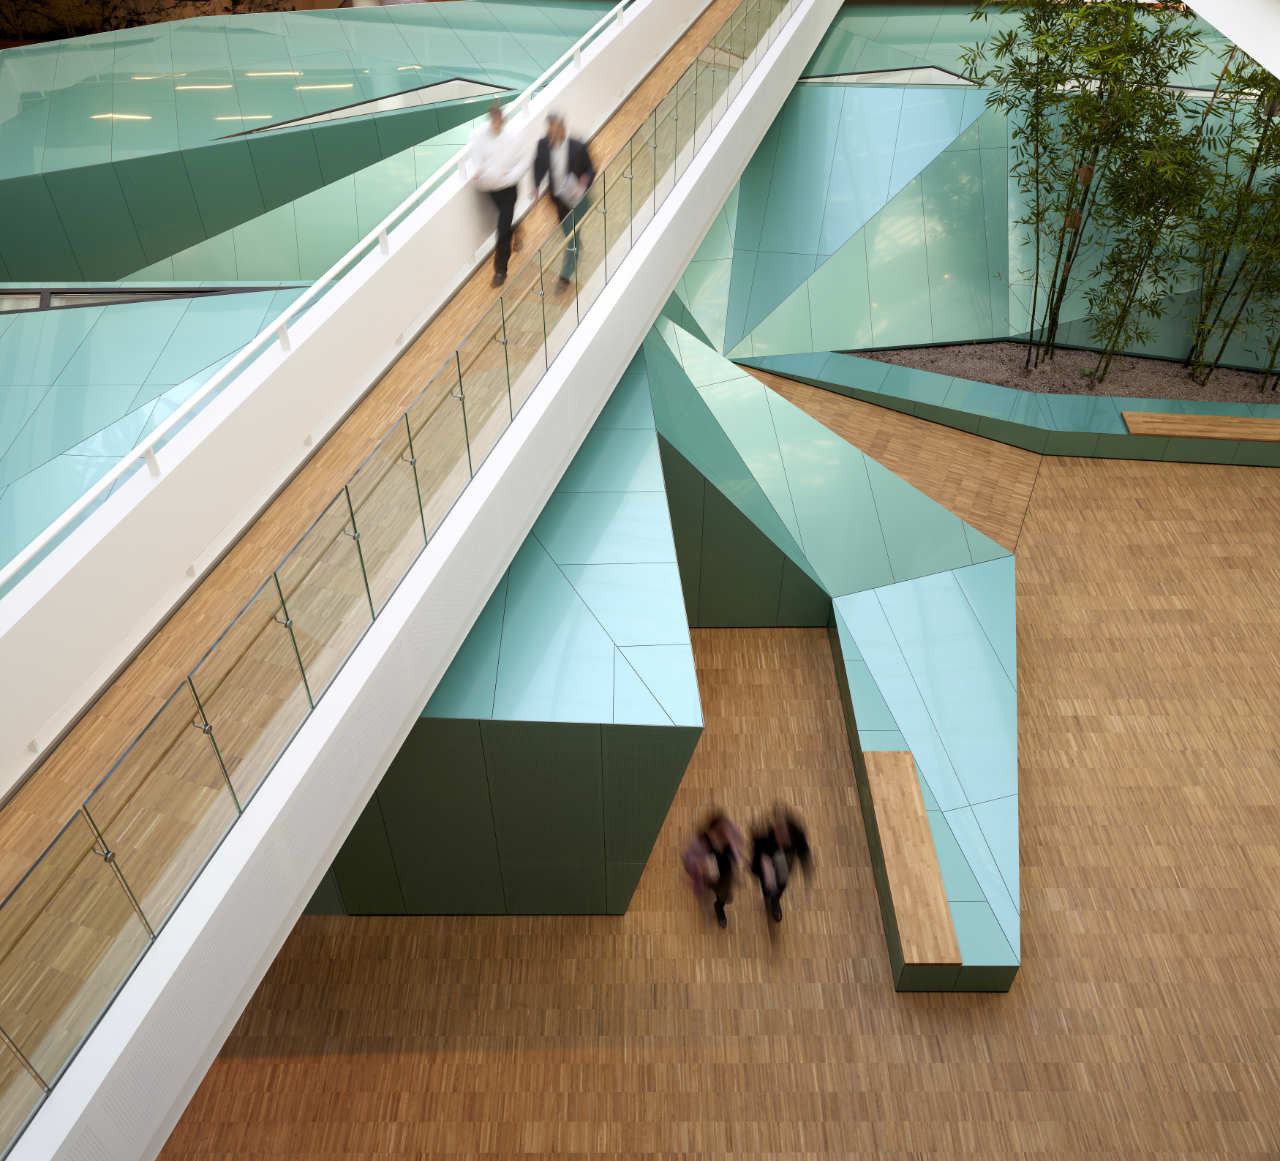 KPMG Headquarters / 3XN Architects, © Adam Mõrk